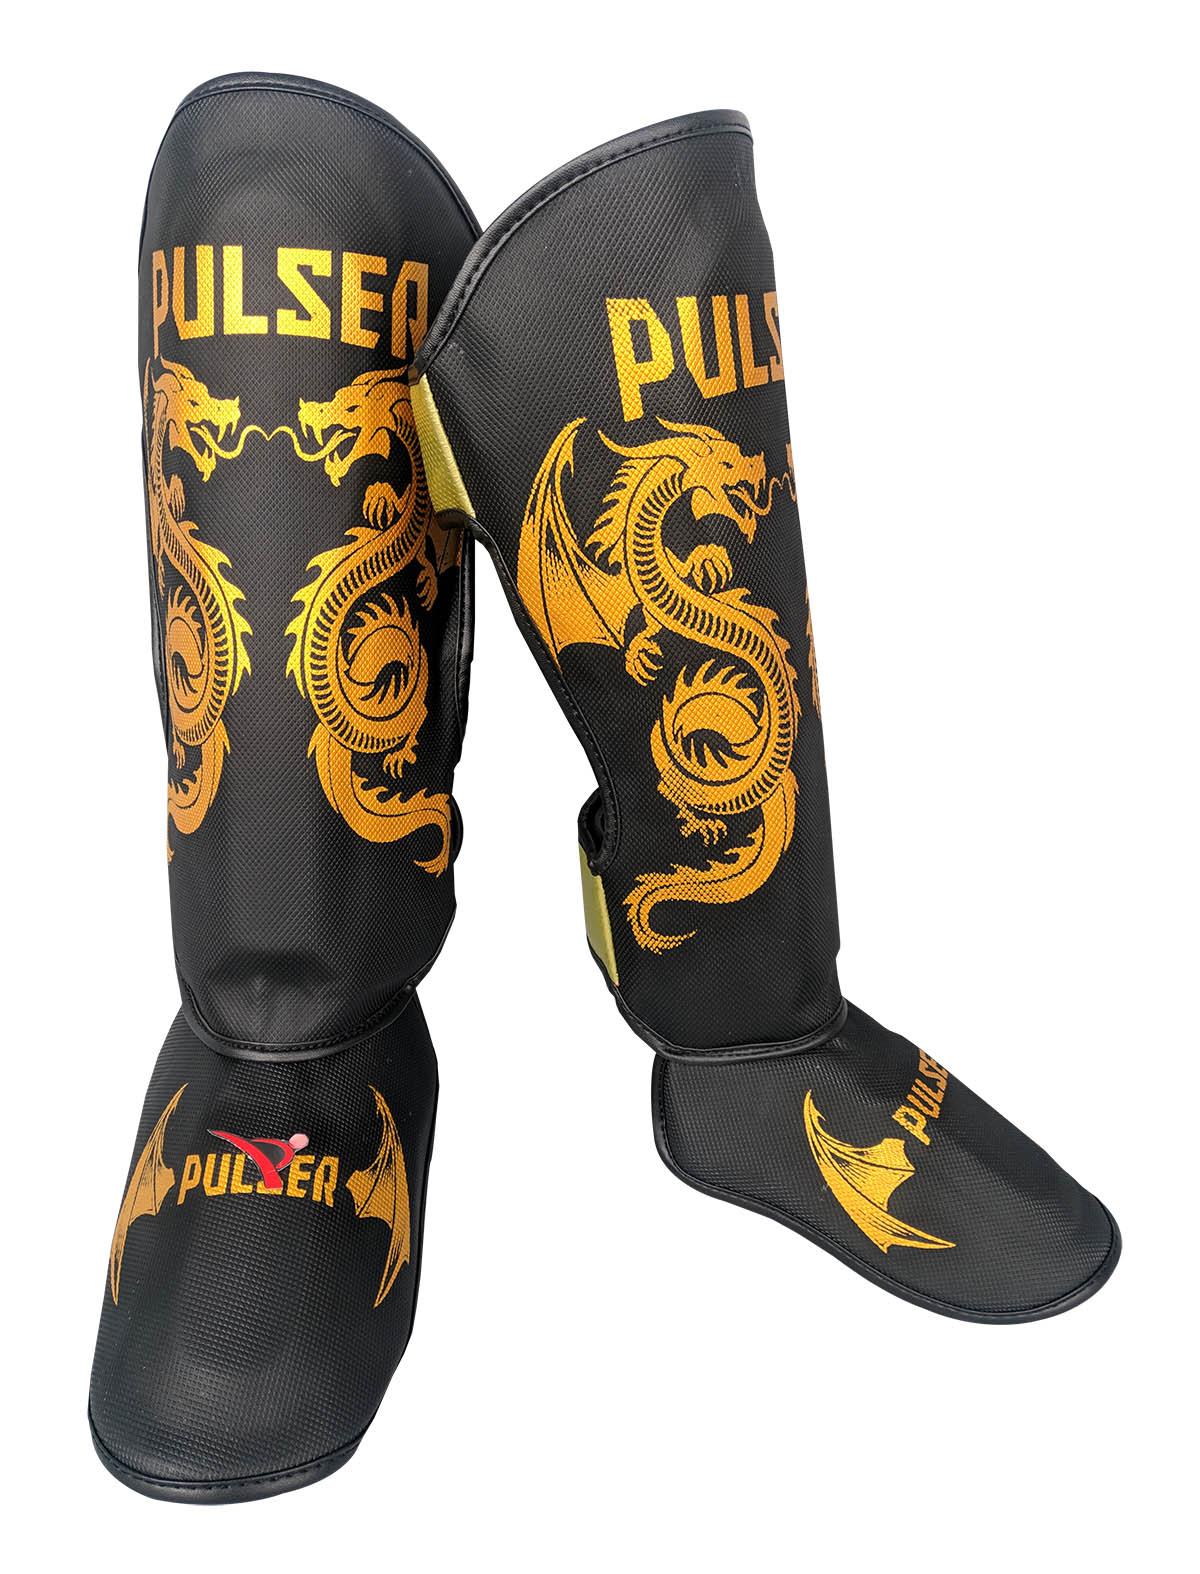 Caneleira Muay Thai MMA Kickboxing Tamanho Grande 30mm - Pulser  - PRALUTA SHOP